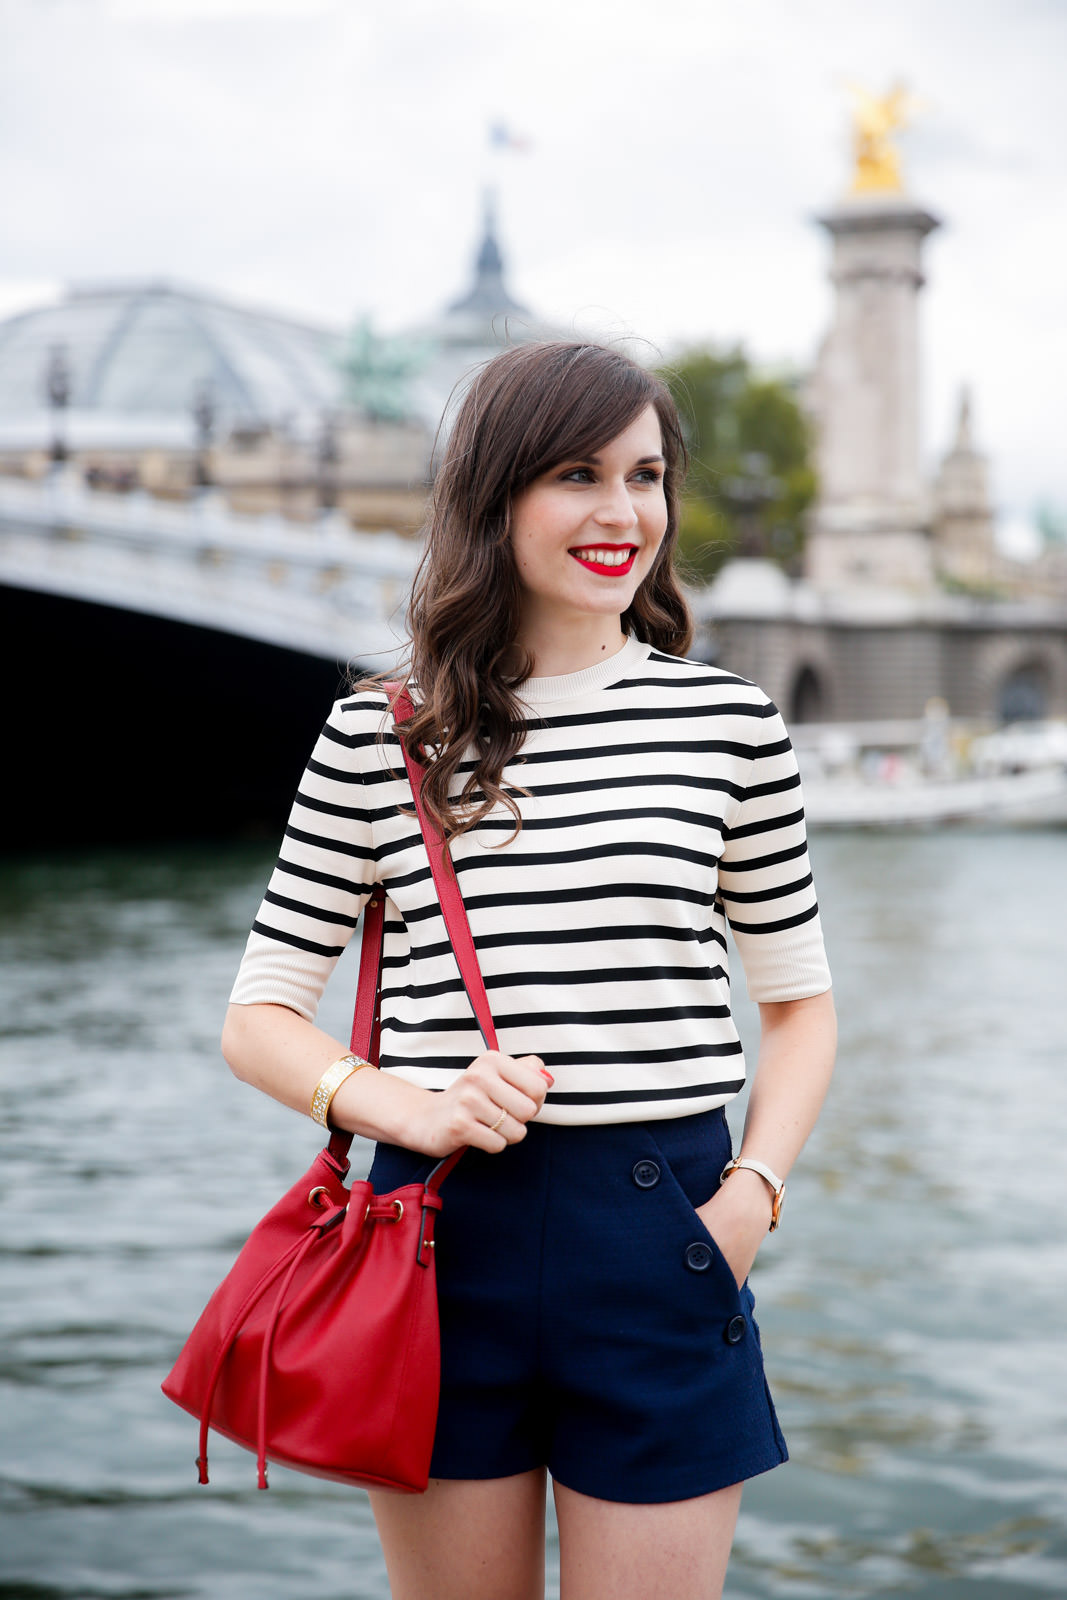 Blog-Mode-And-The-City-Les-Rouges-Velvet-Et-12h-Bourjois-5